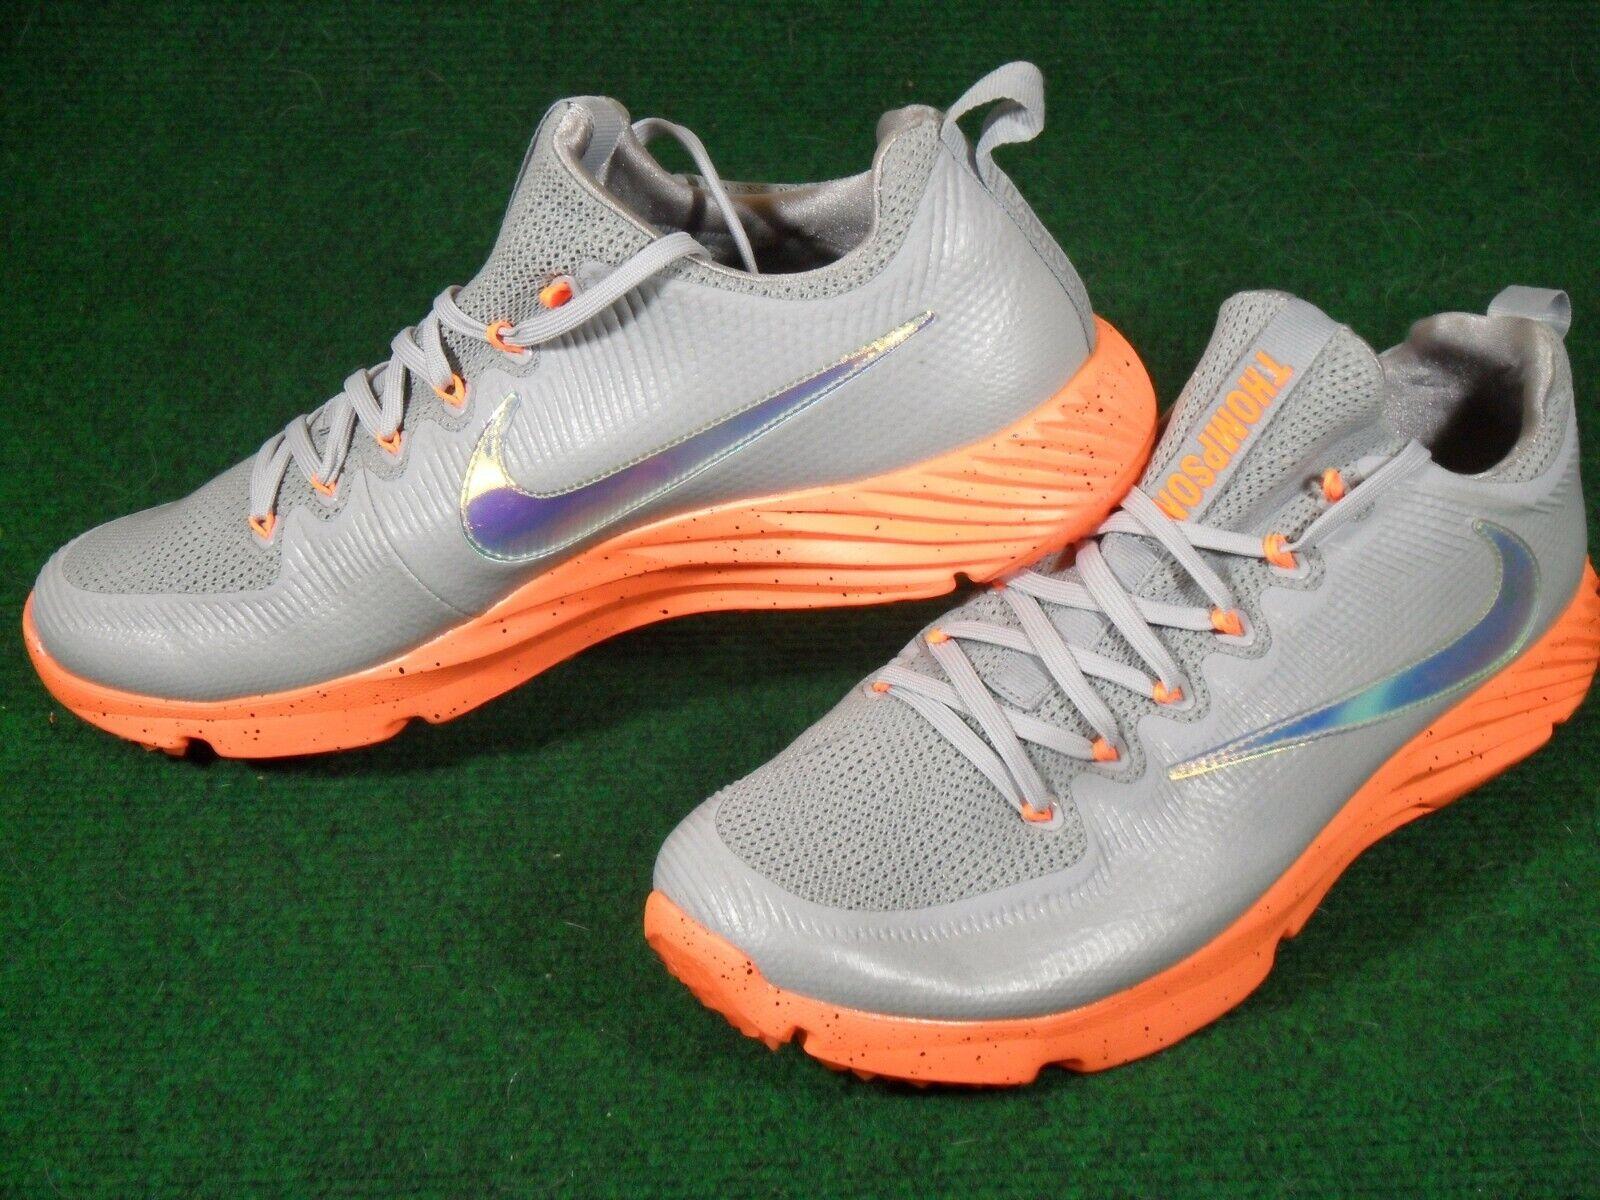 Nike Vapor Speed Turf купить на eBay в